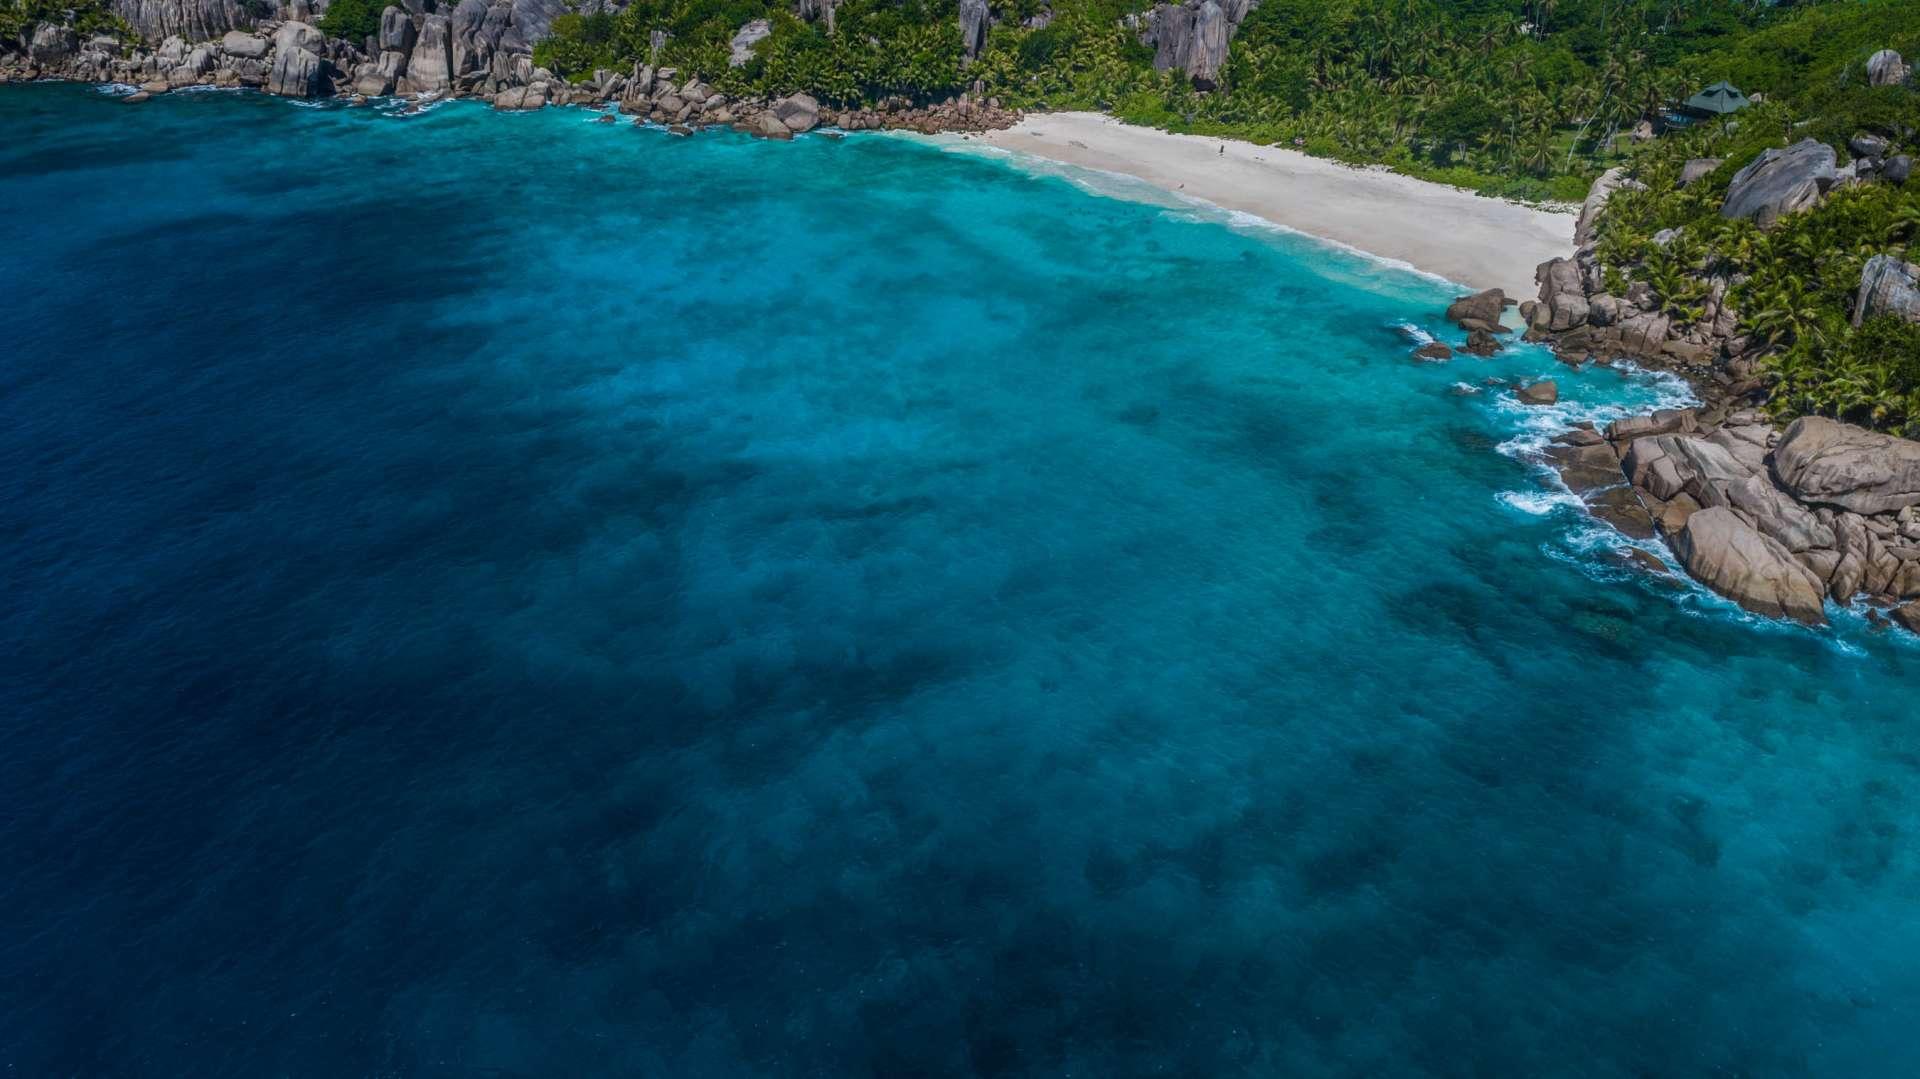 Seychelles Grande Soeur Big Sister Island aerial view drone enrico pescantini from above